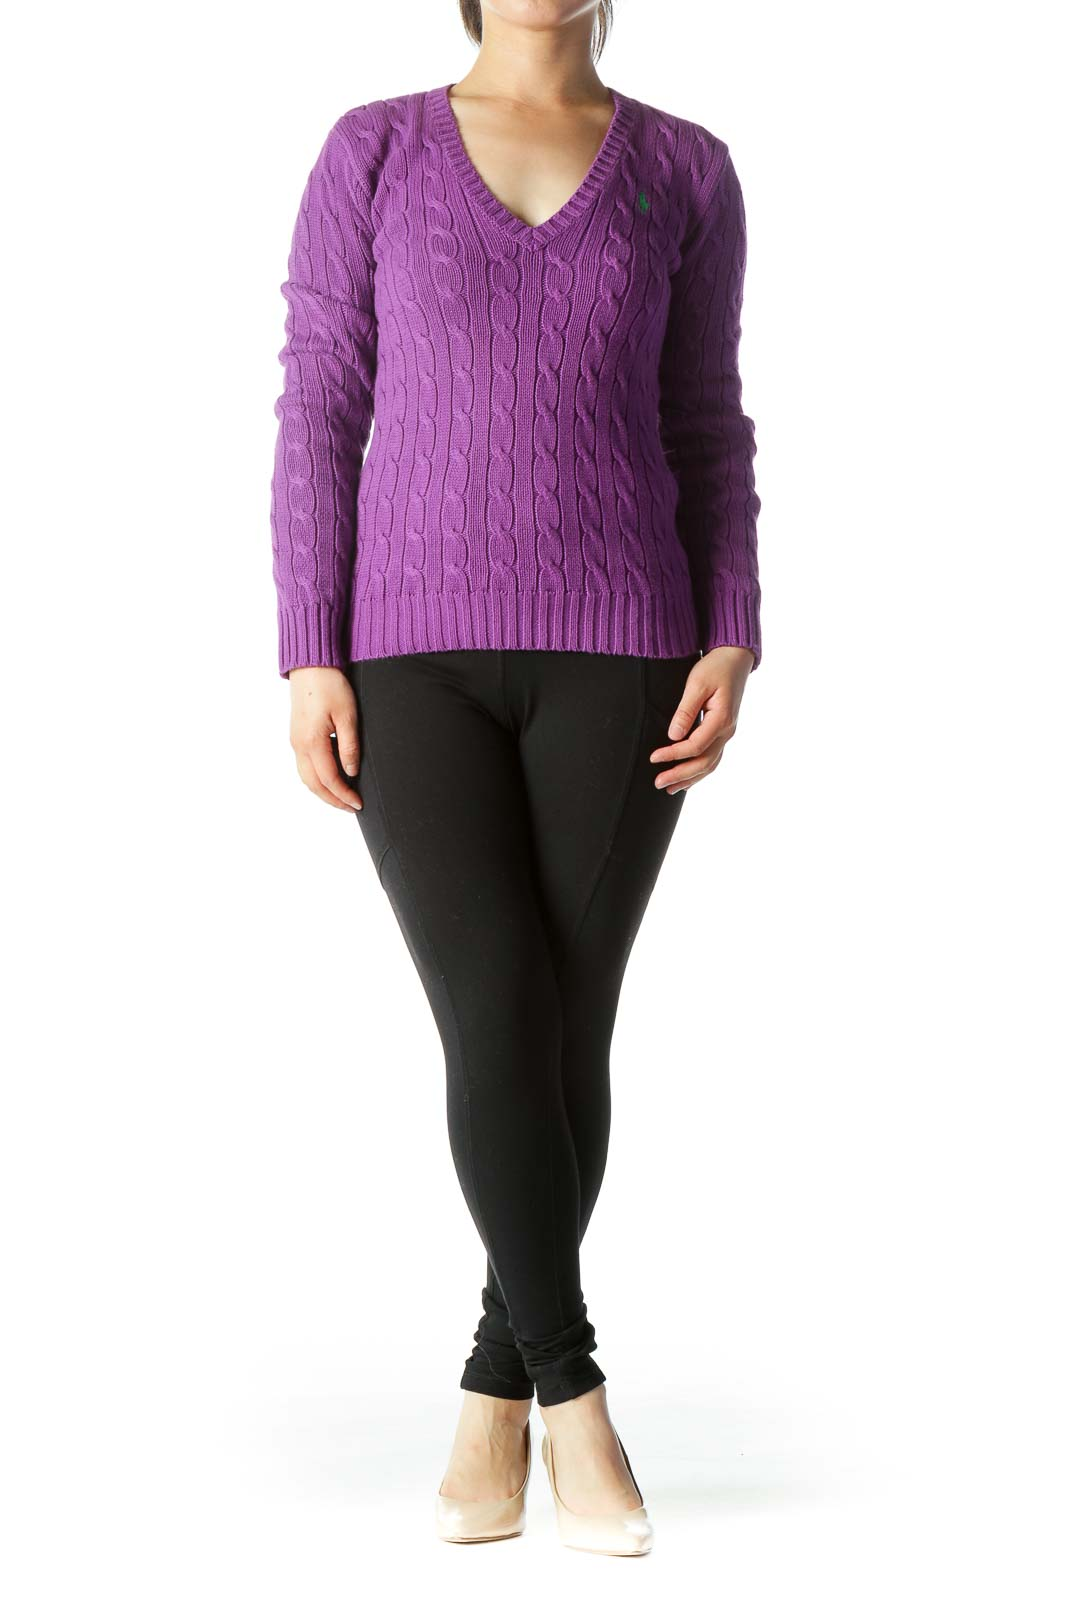 Purple 100% Cotton V-Neck Knit Long-Sleeve Sweater